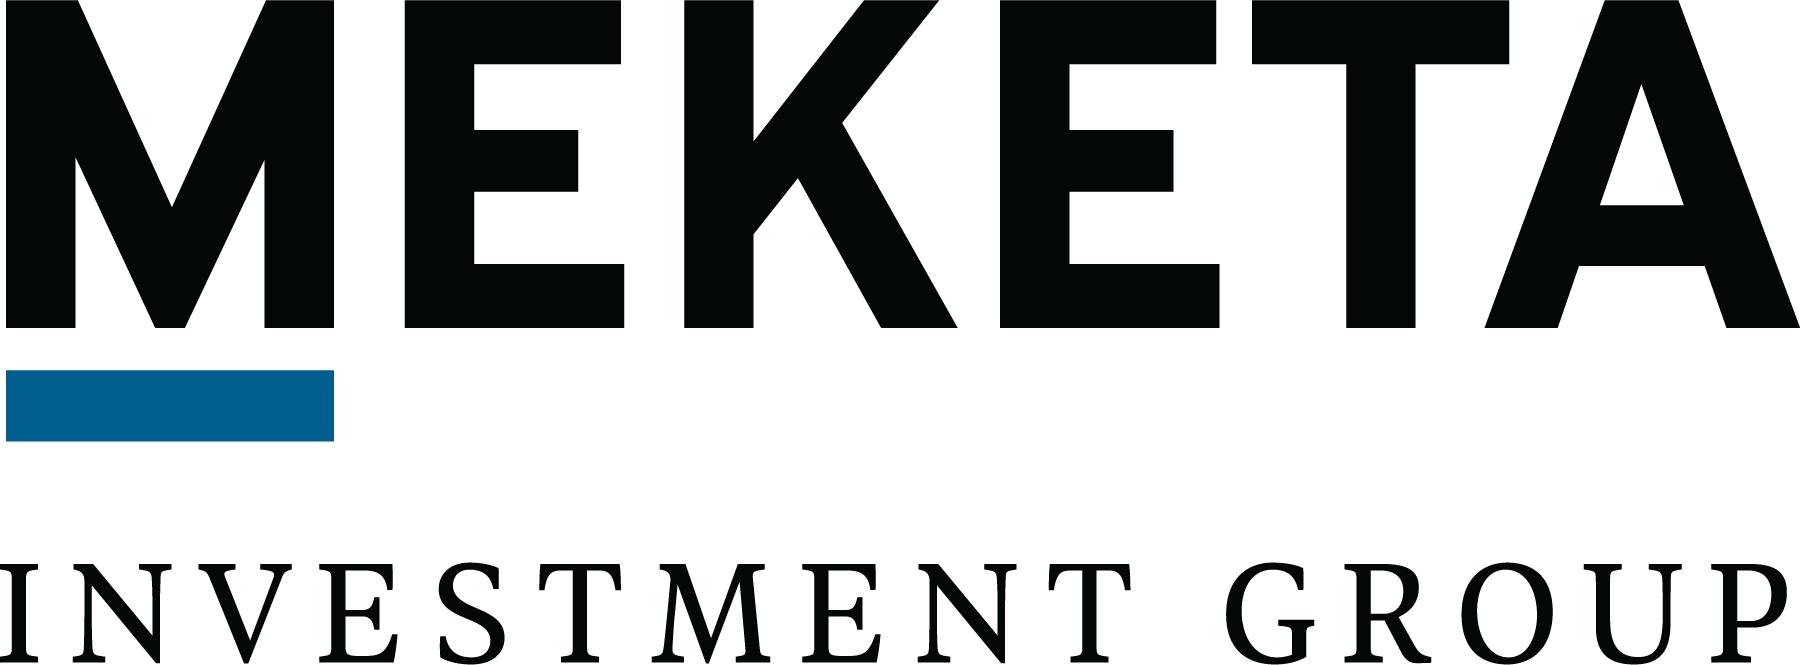 Meketa group investments rmbl investments ltd